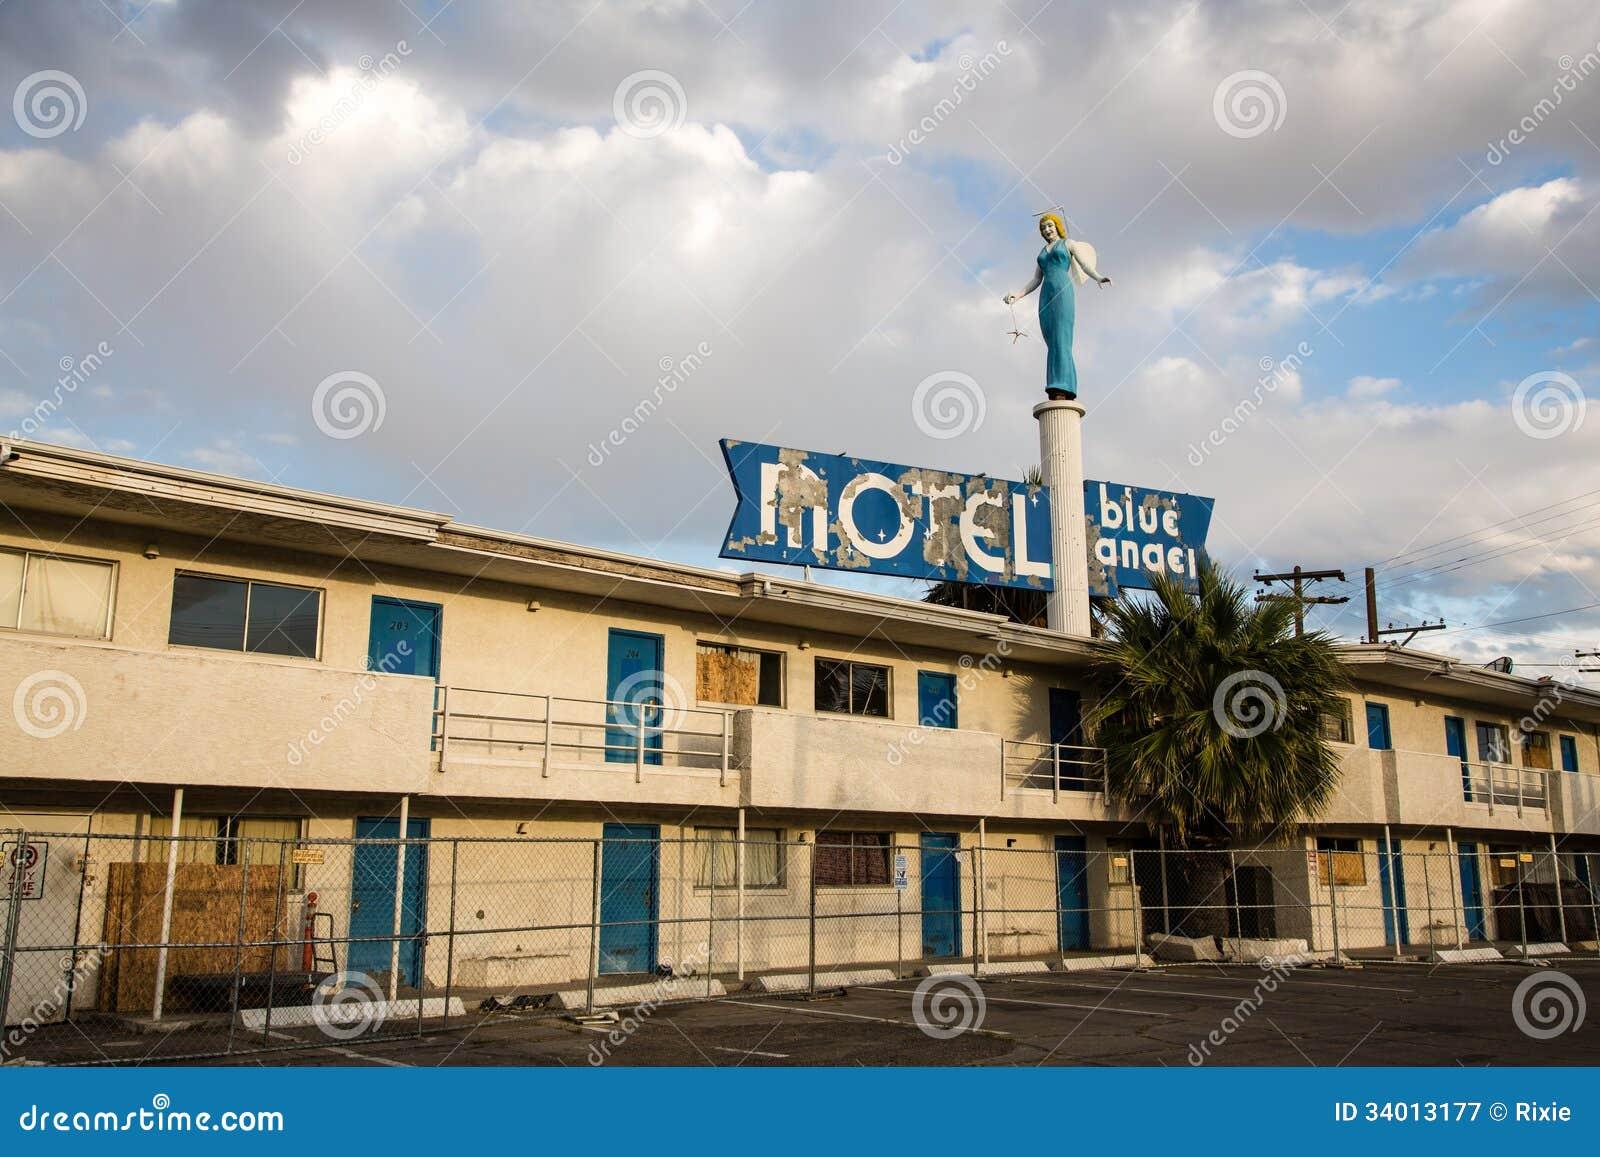 Motel  Las Vegas Prices